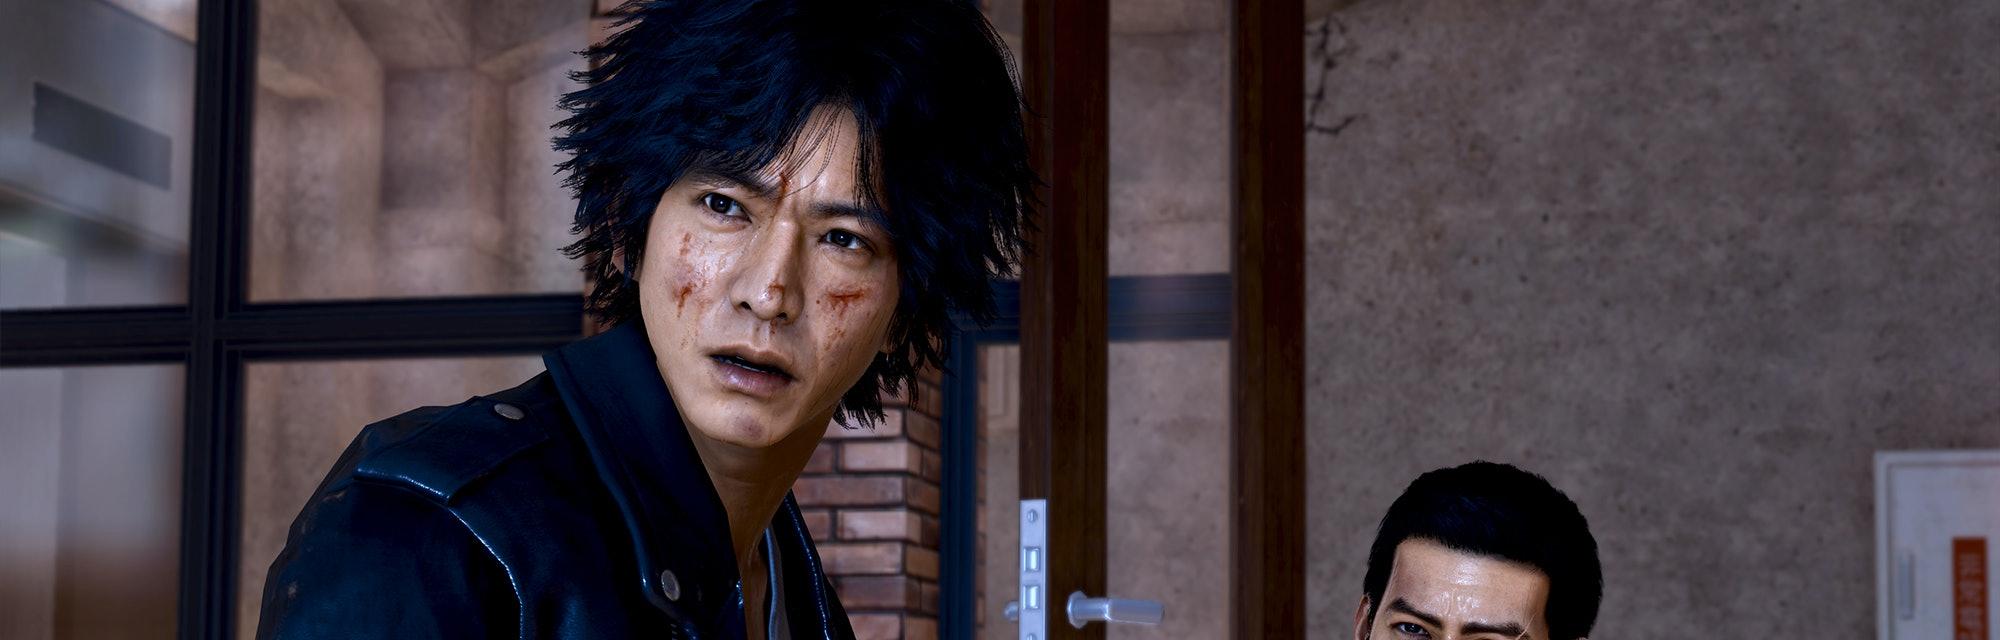 lost judgment yagami and kaito